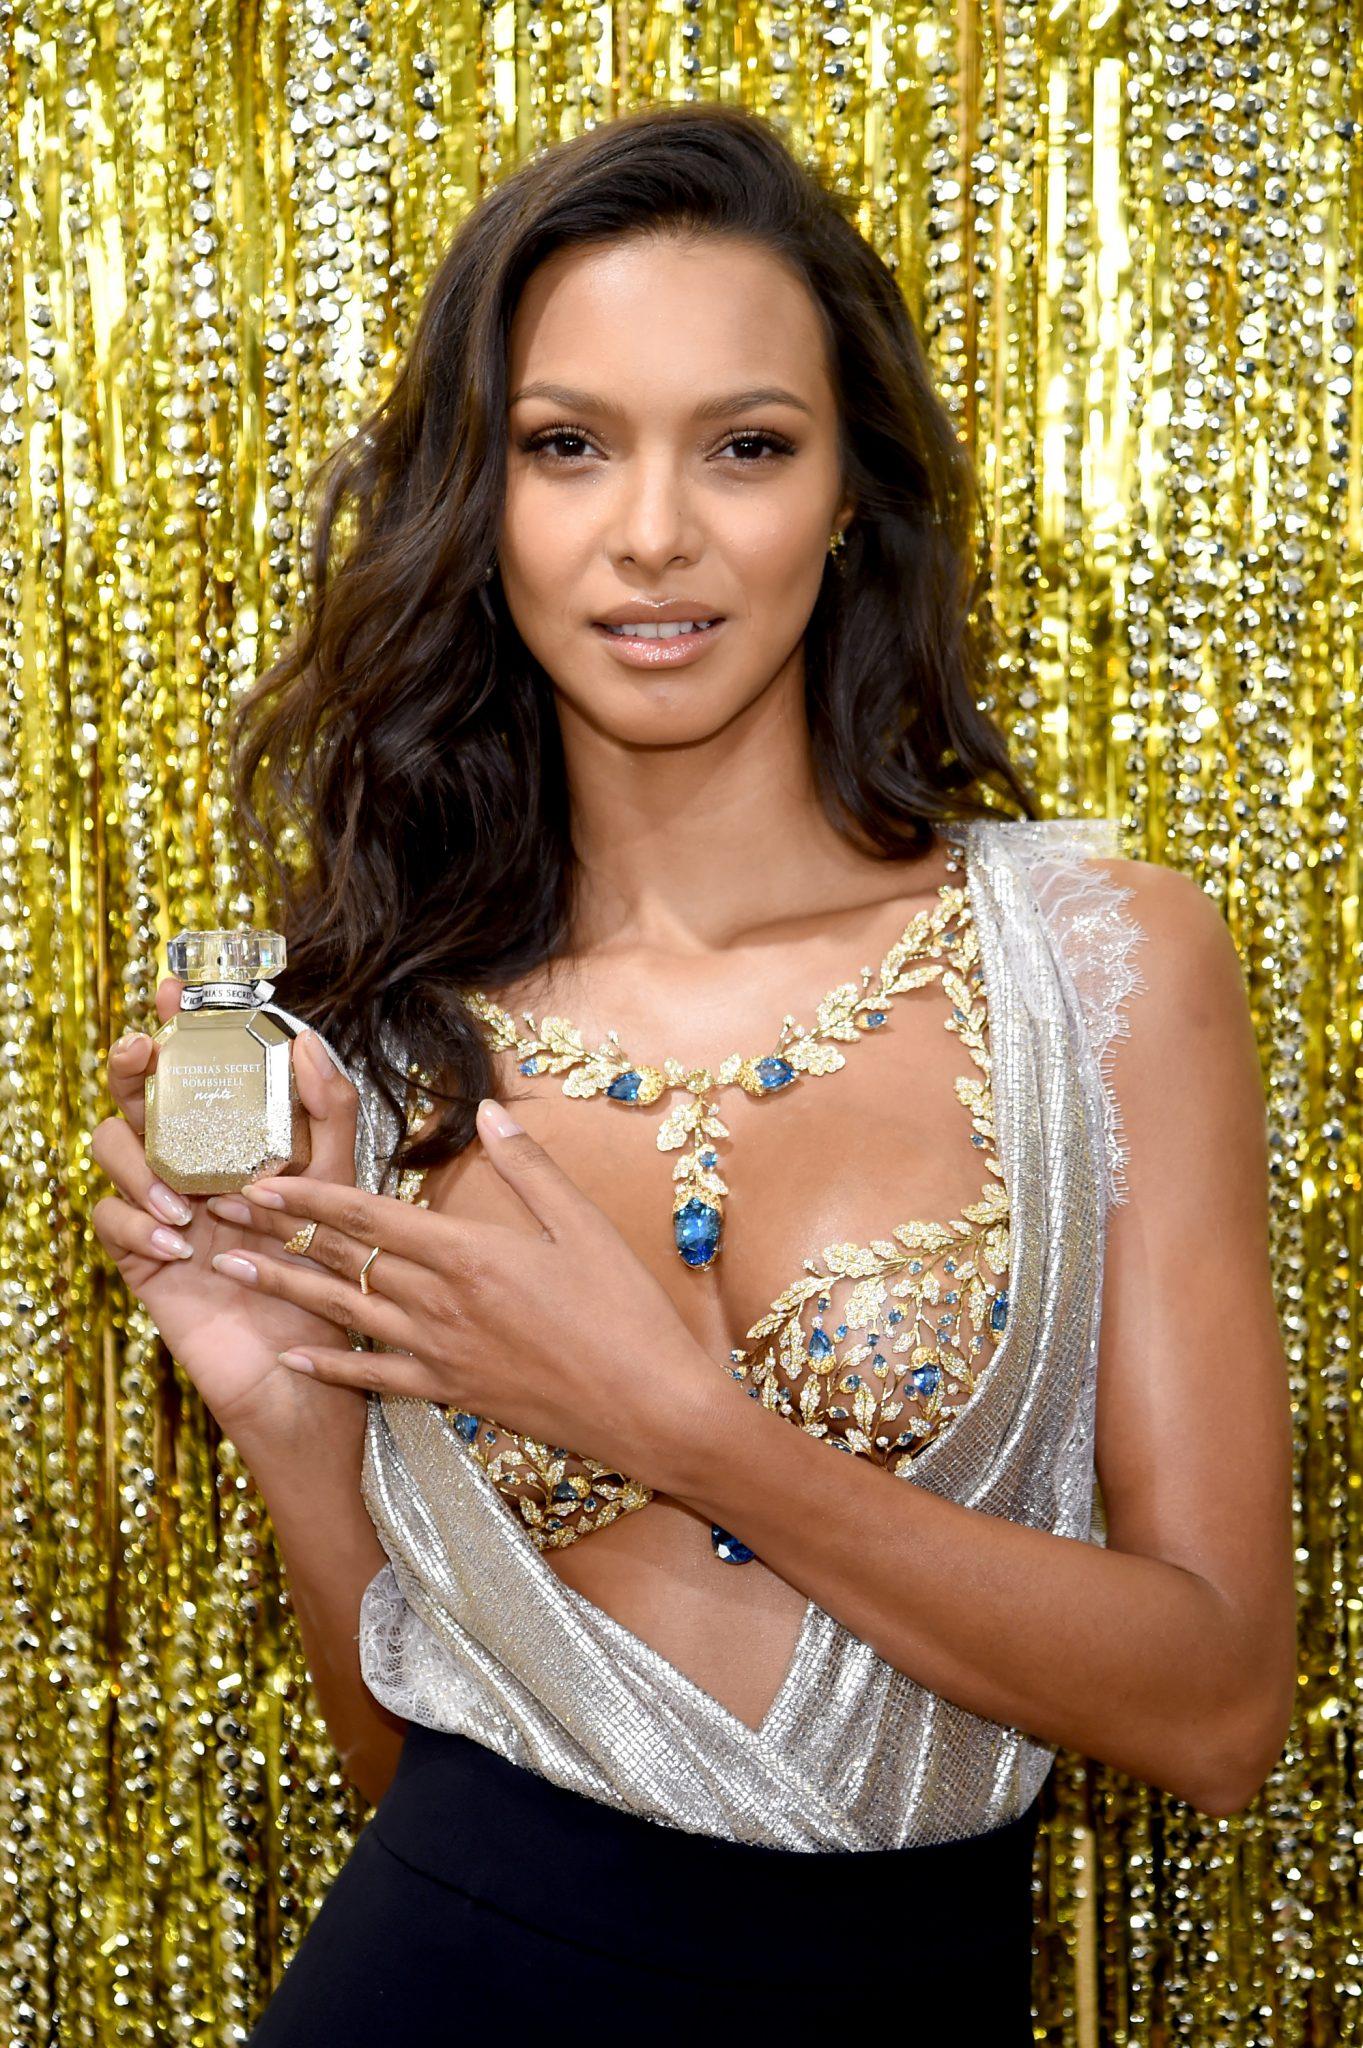 New Fragrance: Victoria's Secret Bombshell Nights